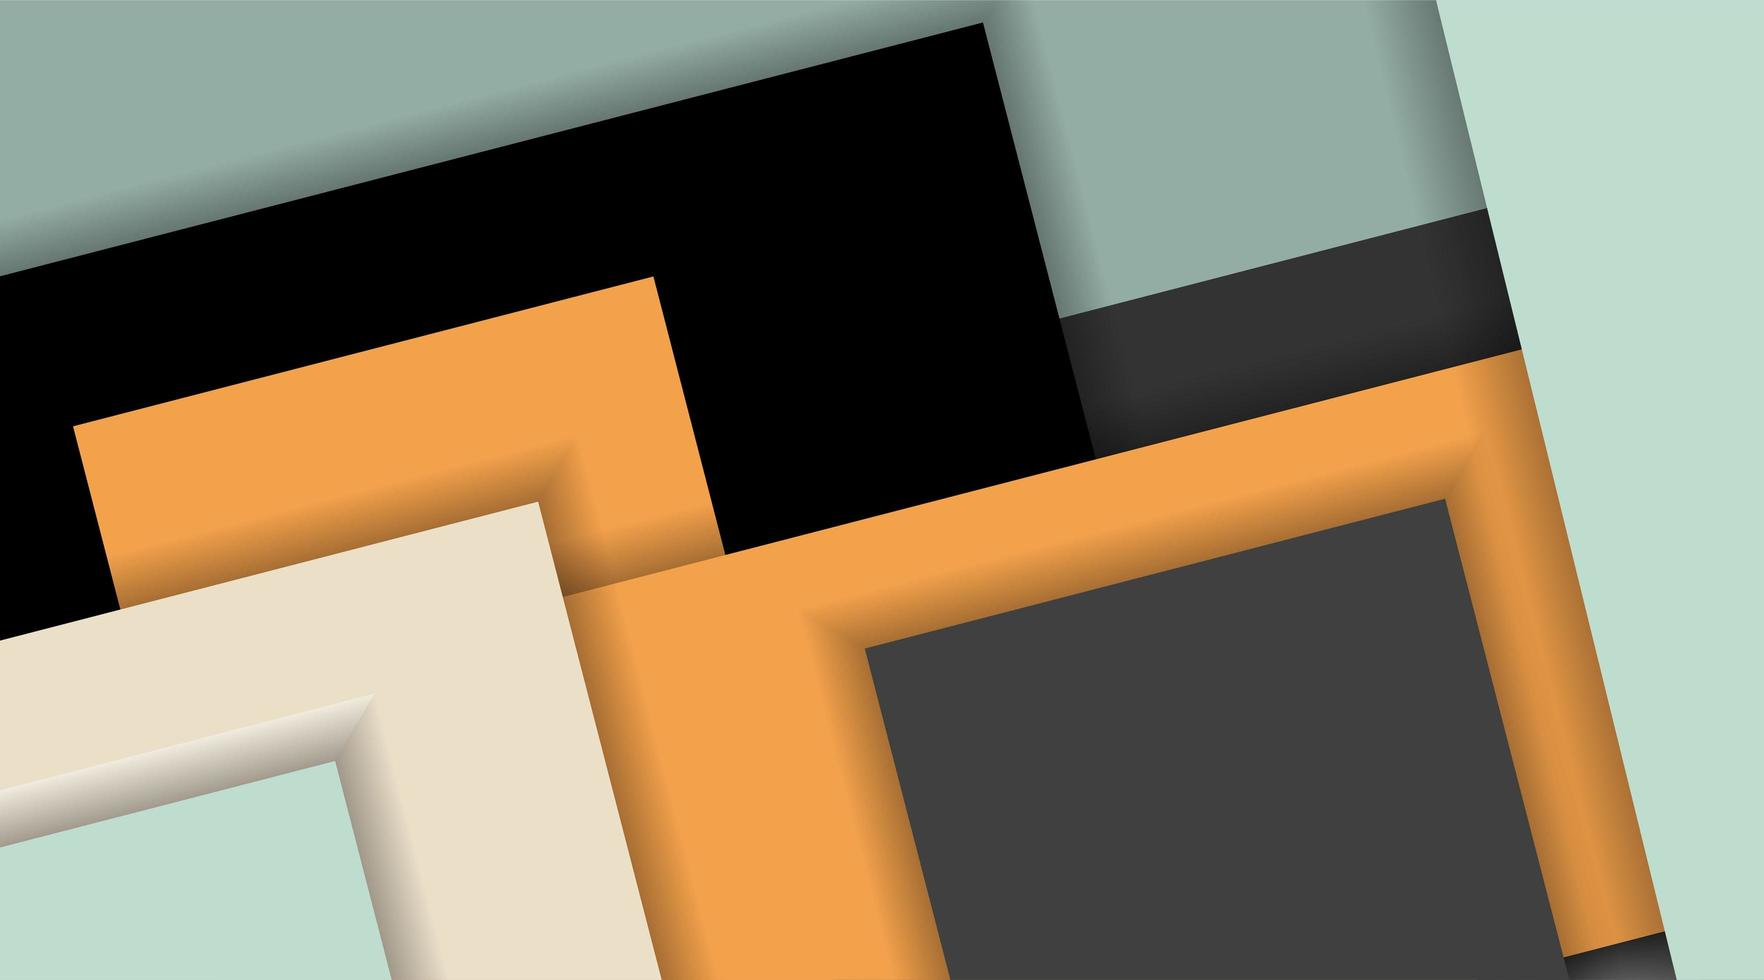 vektor bakgrund abstrakt design geometriska former.